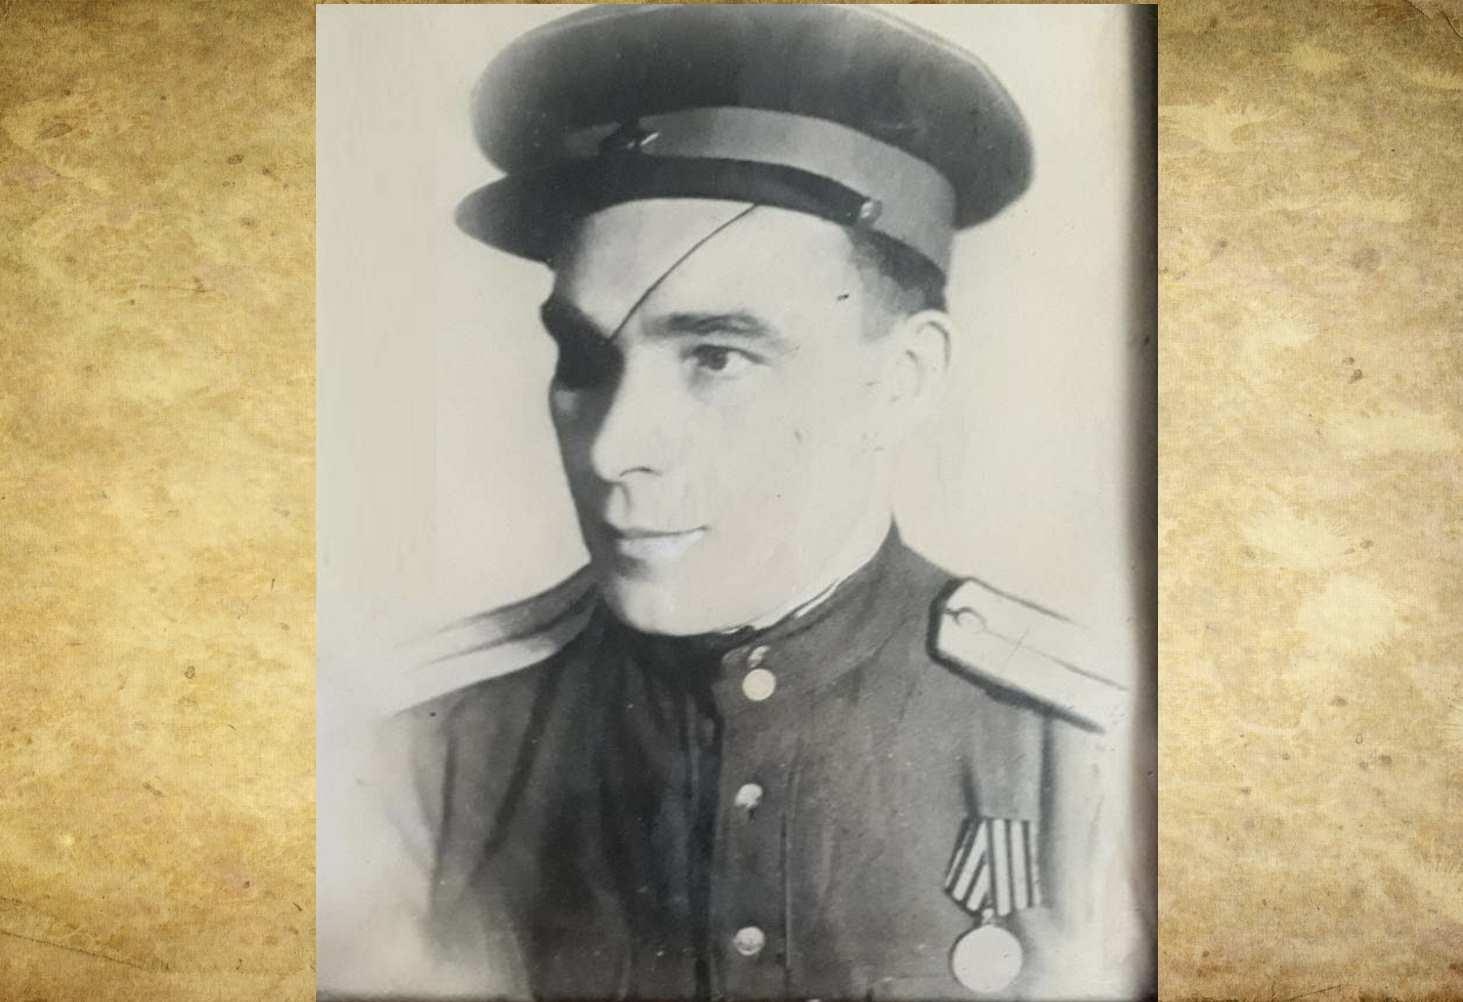 ahmetzyanov-abdulhak-nagmalzyanovich